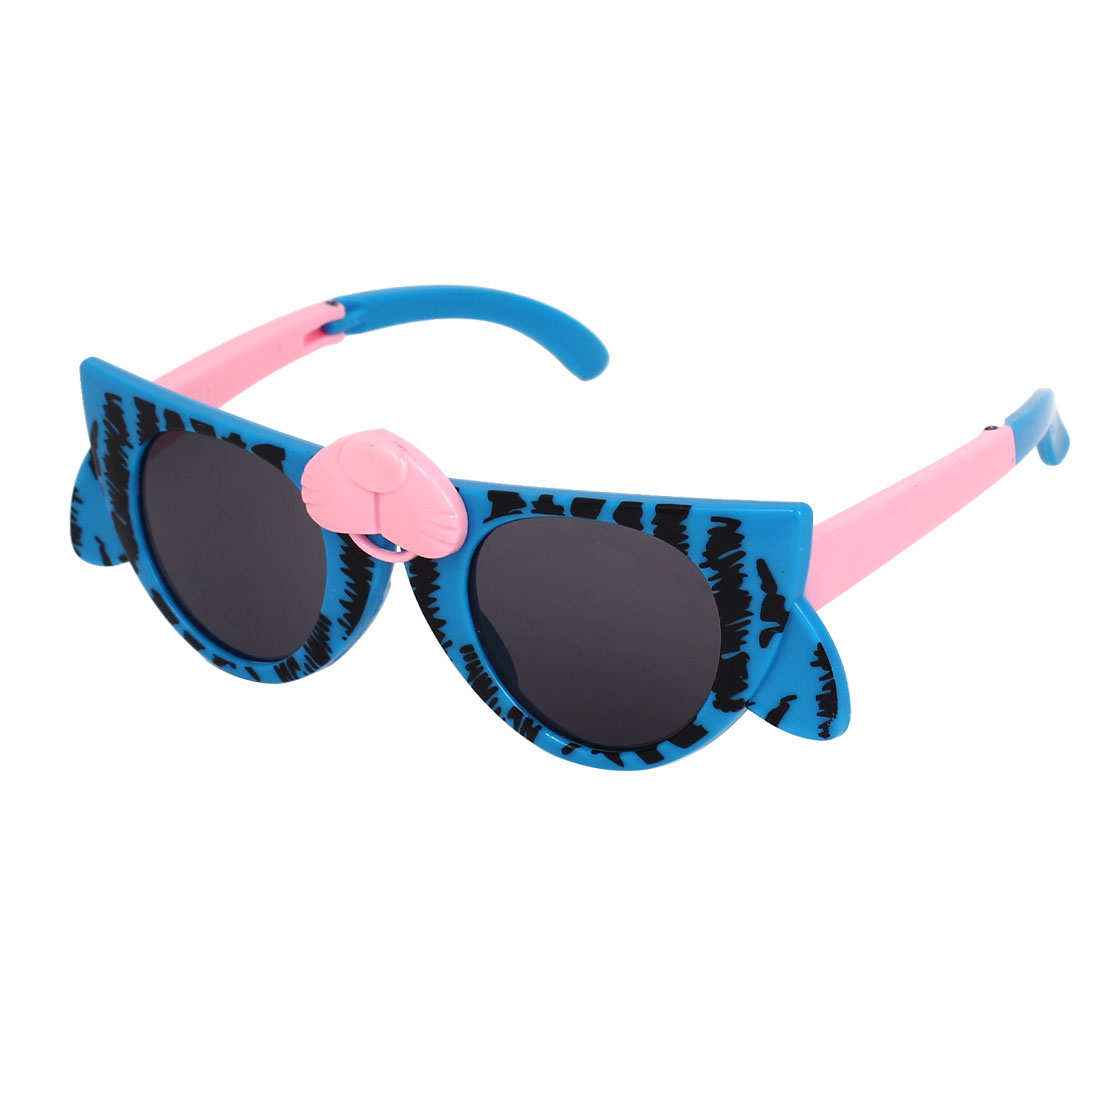 Blue Cartoon Cat Design Plastic Frame Black Lens Foldable Arm Sunglasses for Children